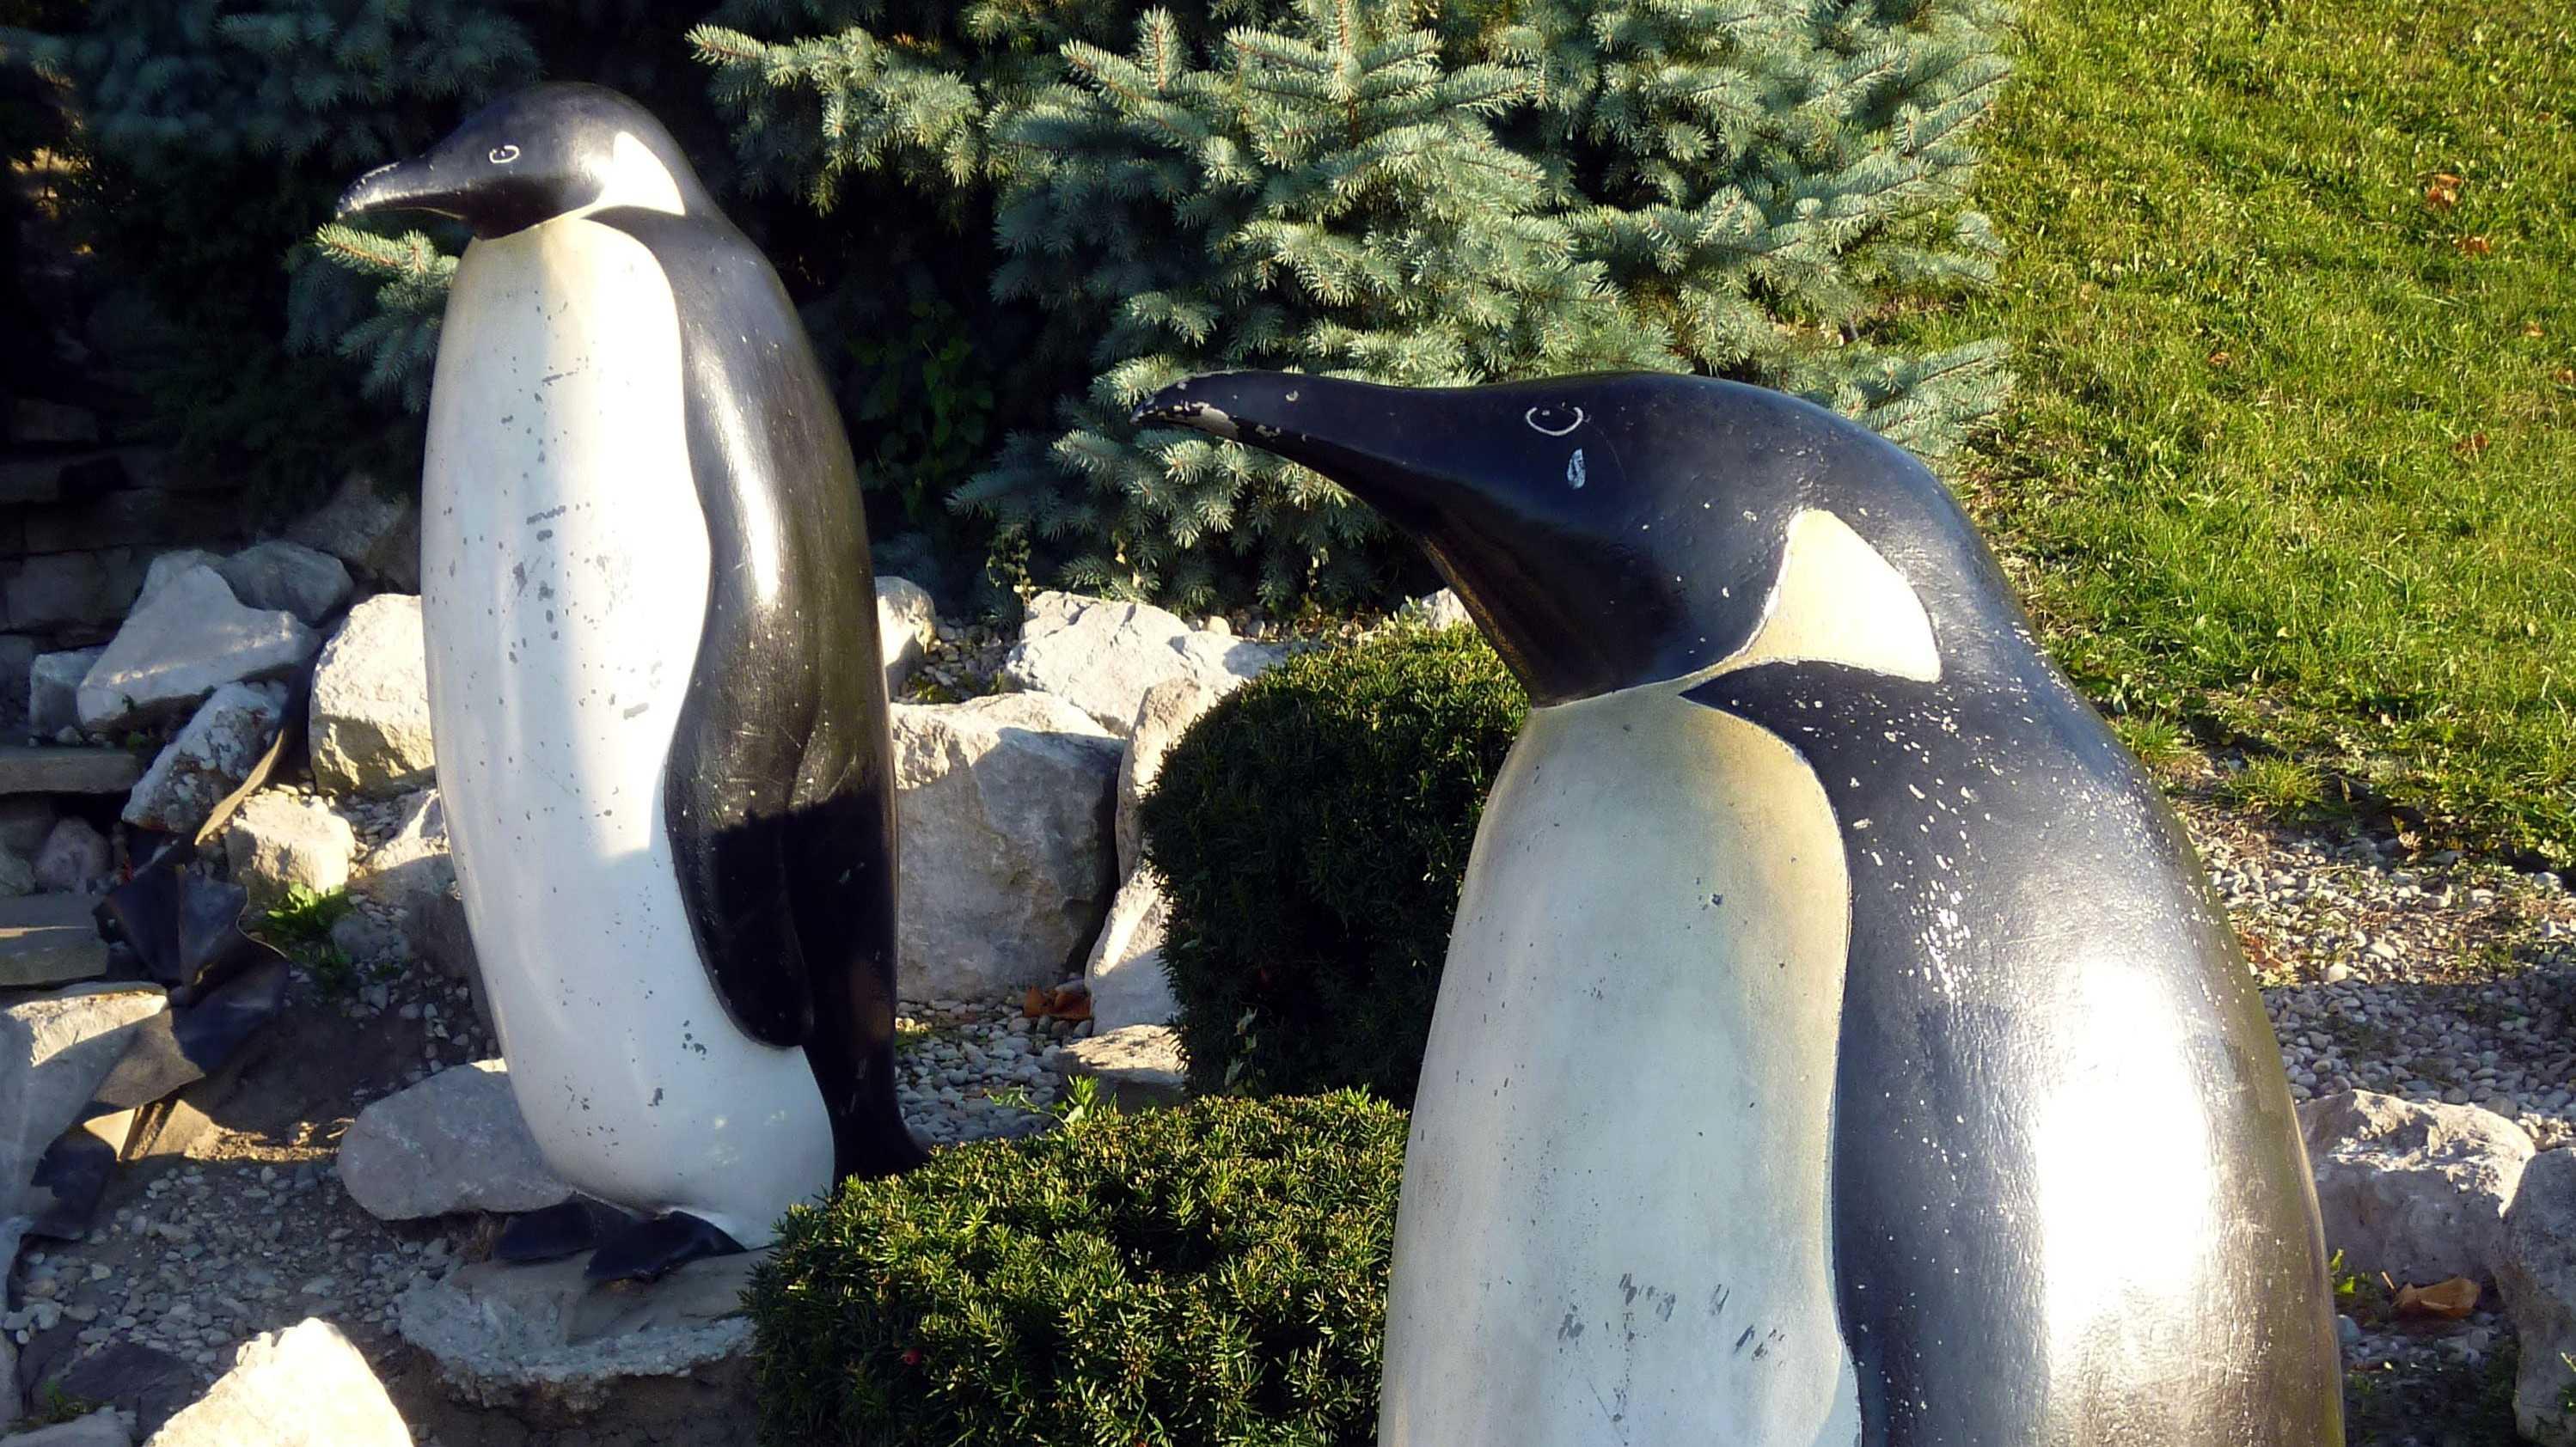 2 Pinguin-Statuen